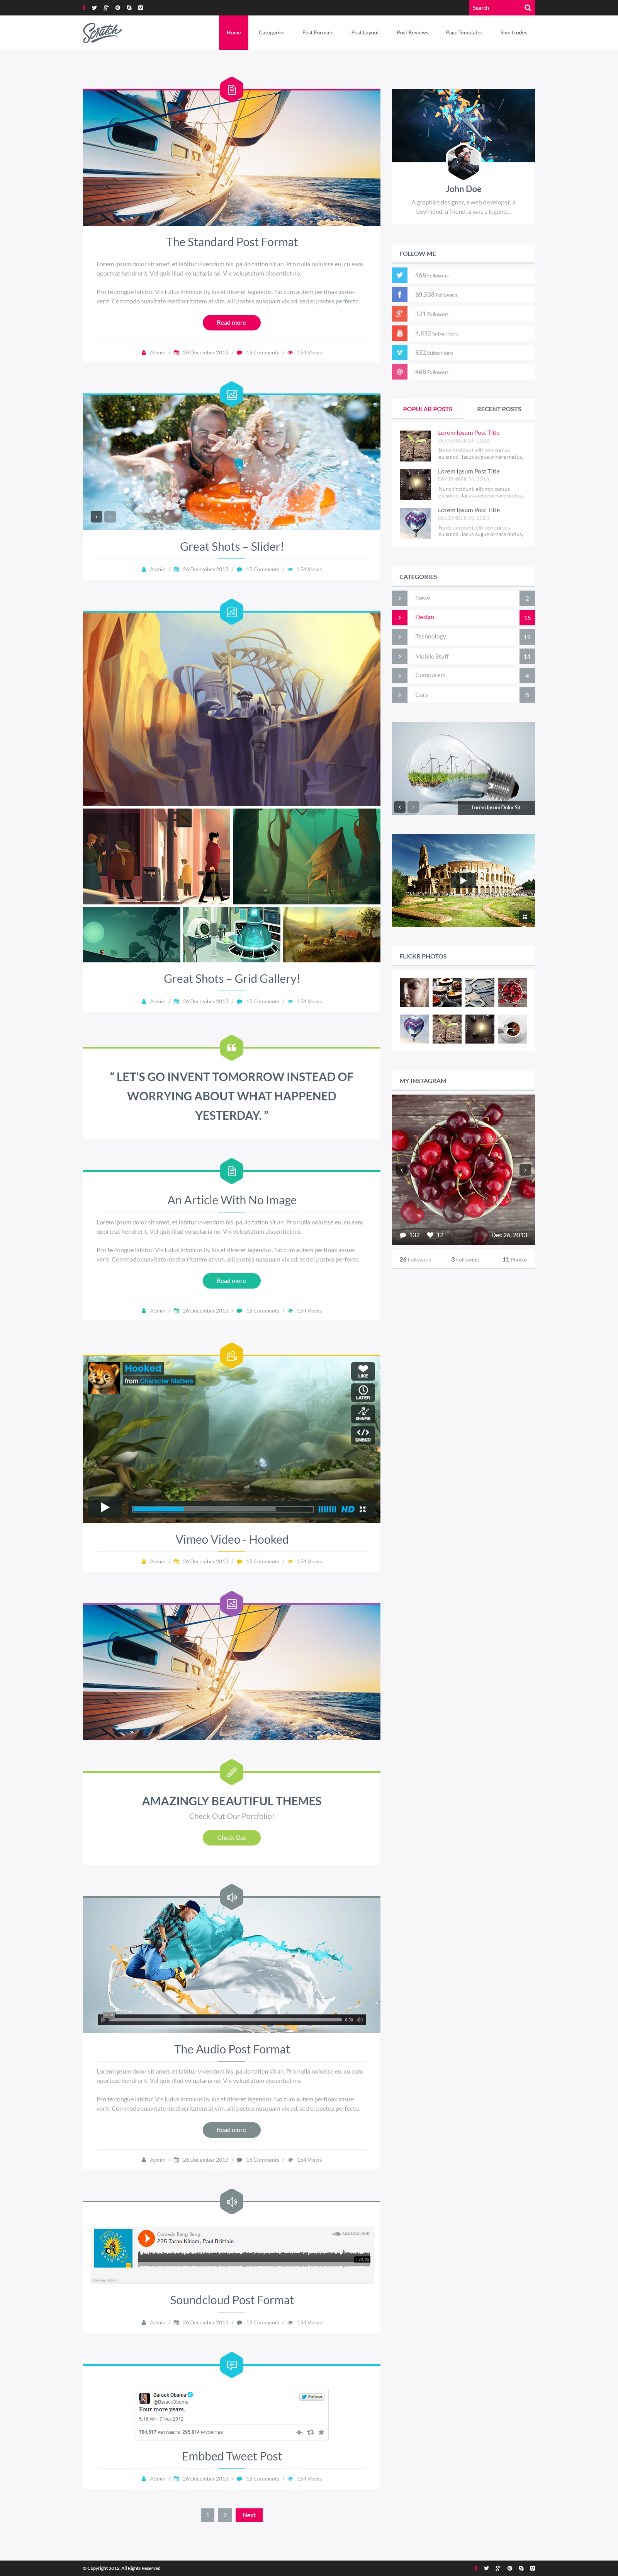 Scratch - Premium Wordpress Blog Theme